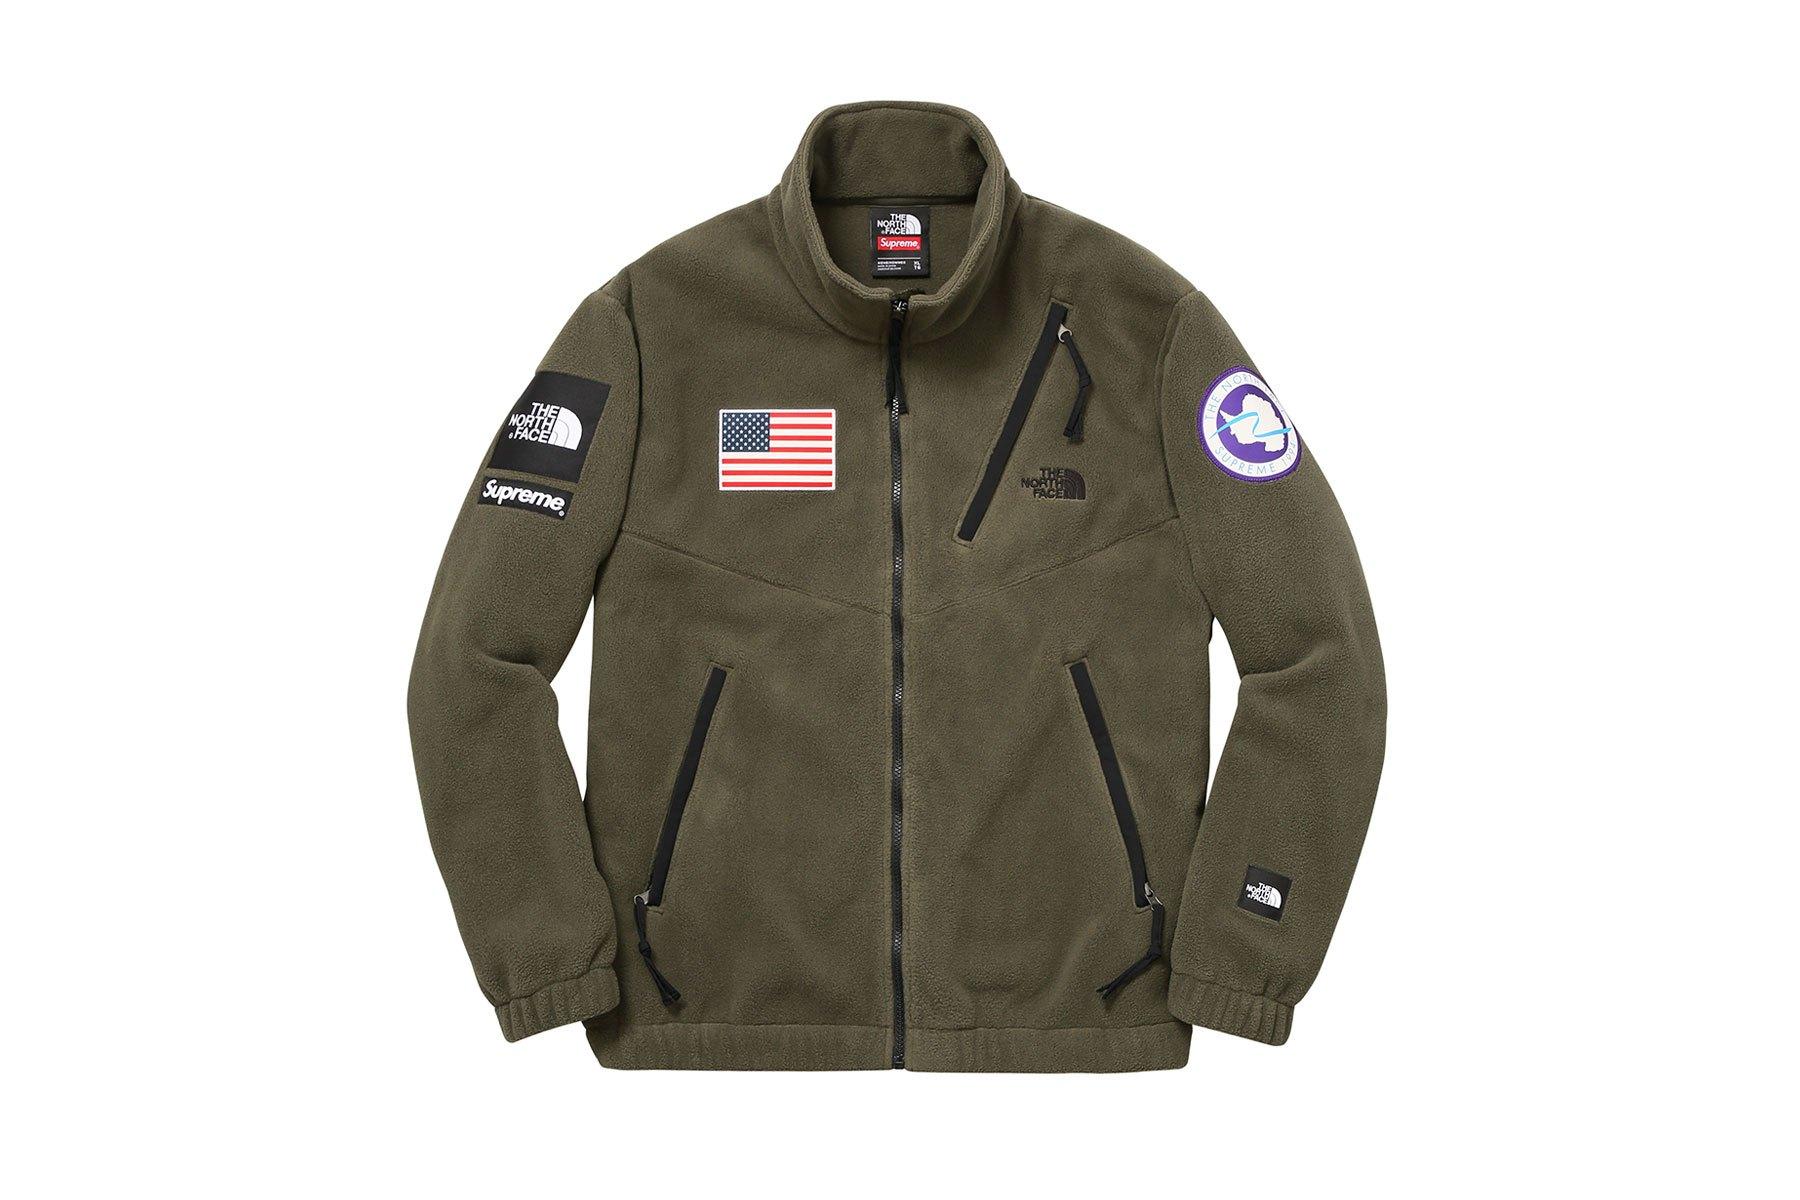 supreme-the-north-face-2017-spring-summer-olive-polartec-fleece-jacket-24